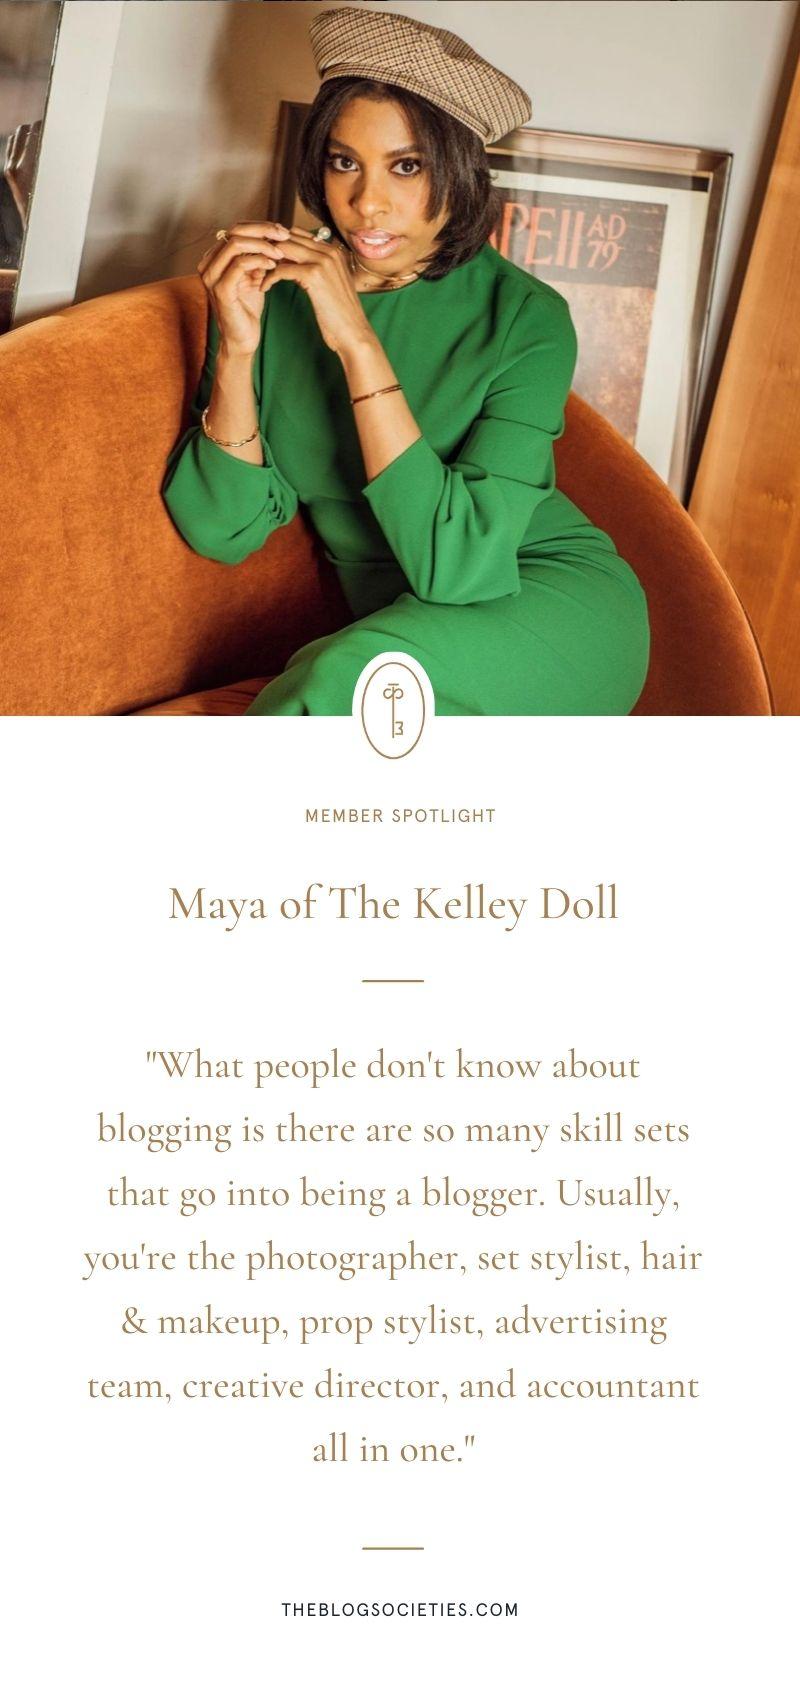 Maya of The Kelley Doll